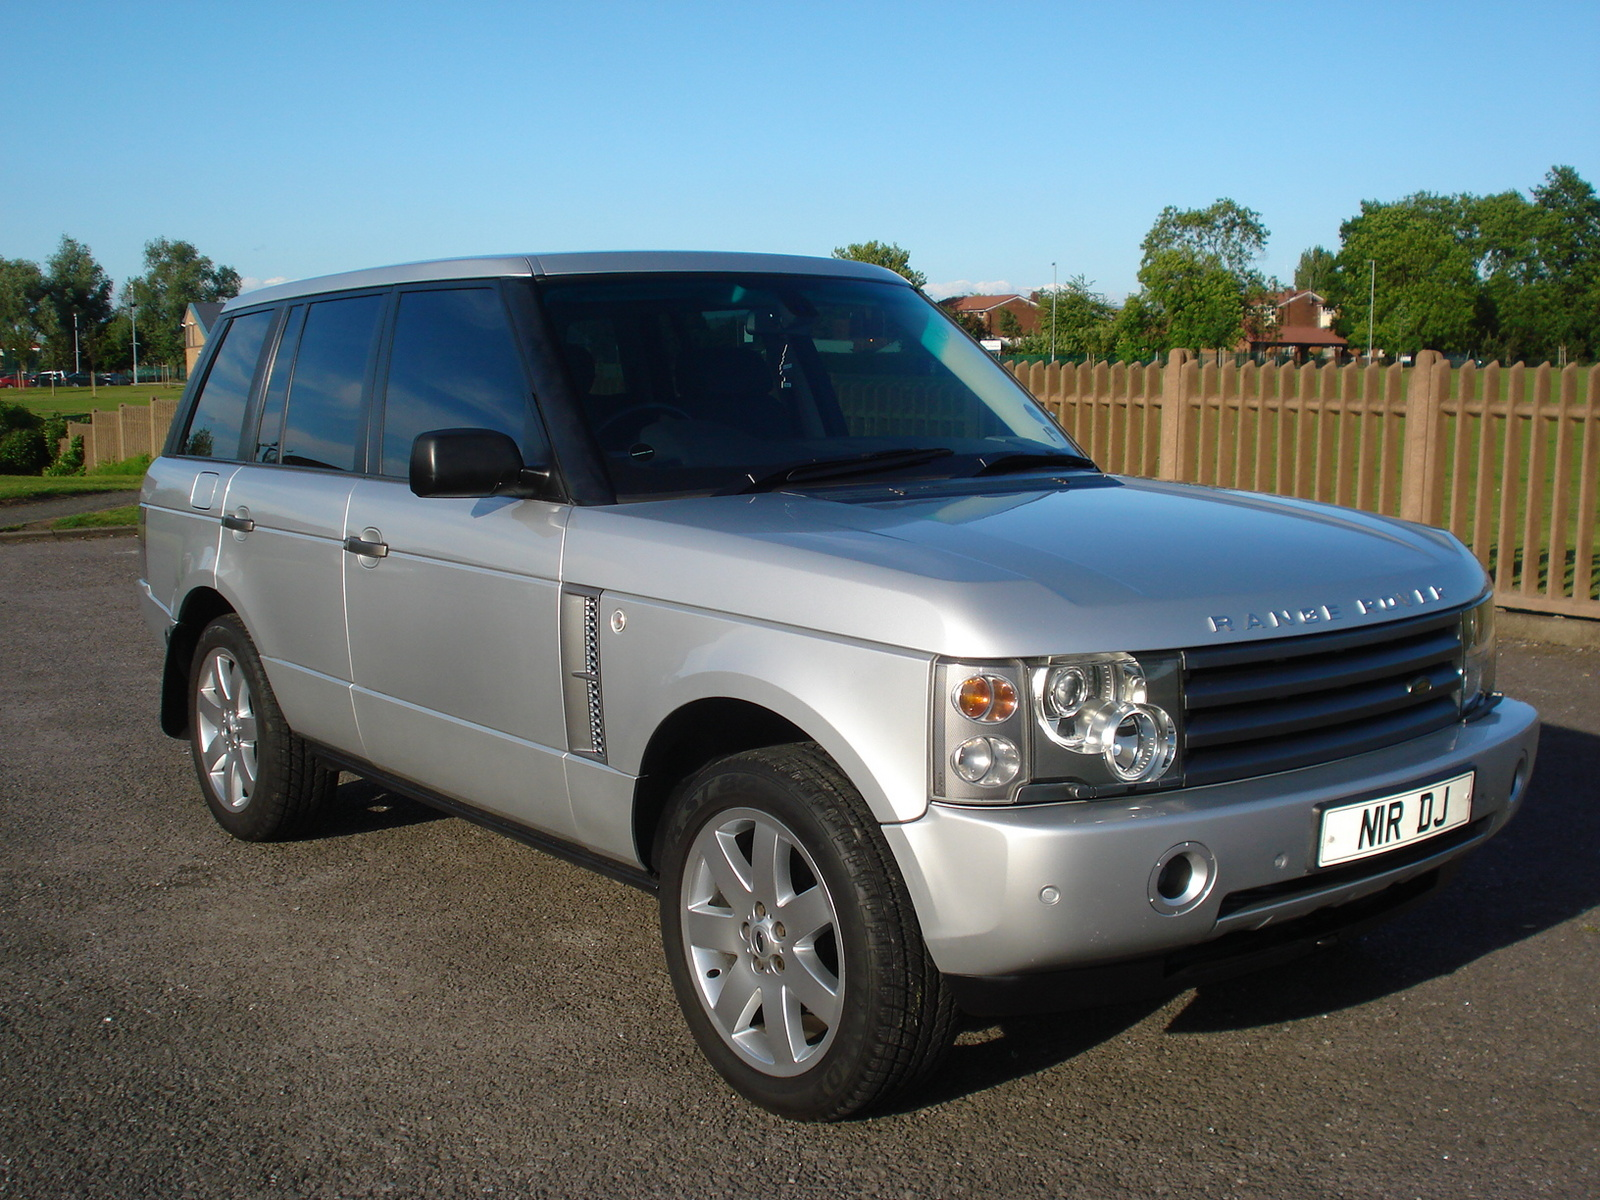 2003 Land Rover Range Rover Pictures Cargurus